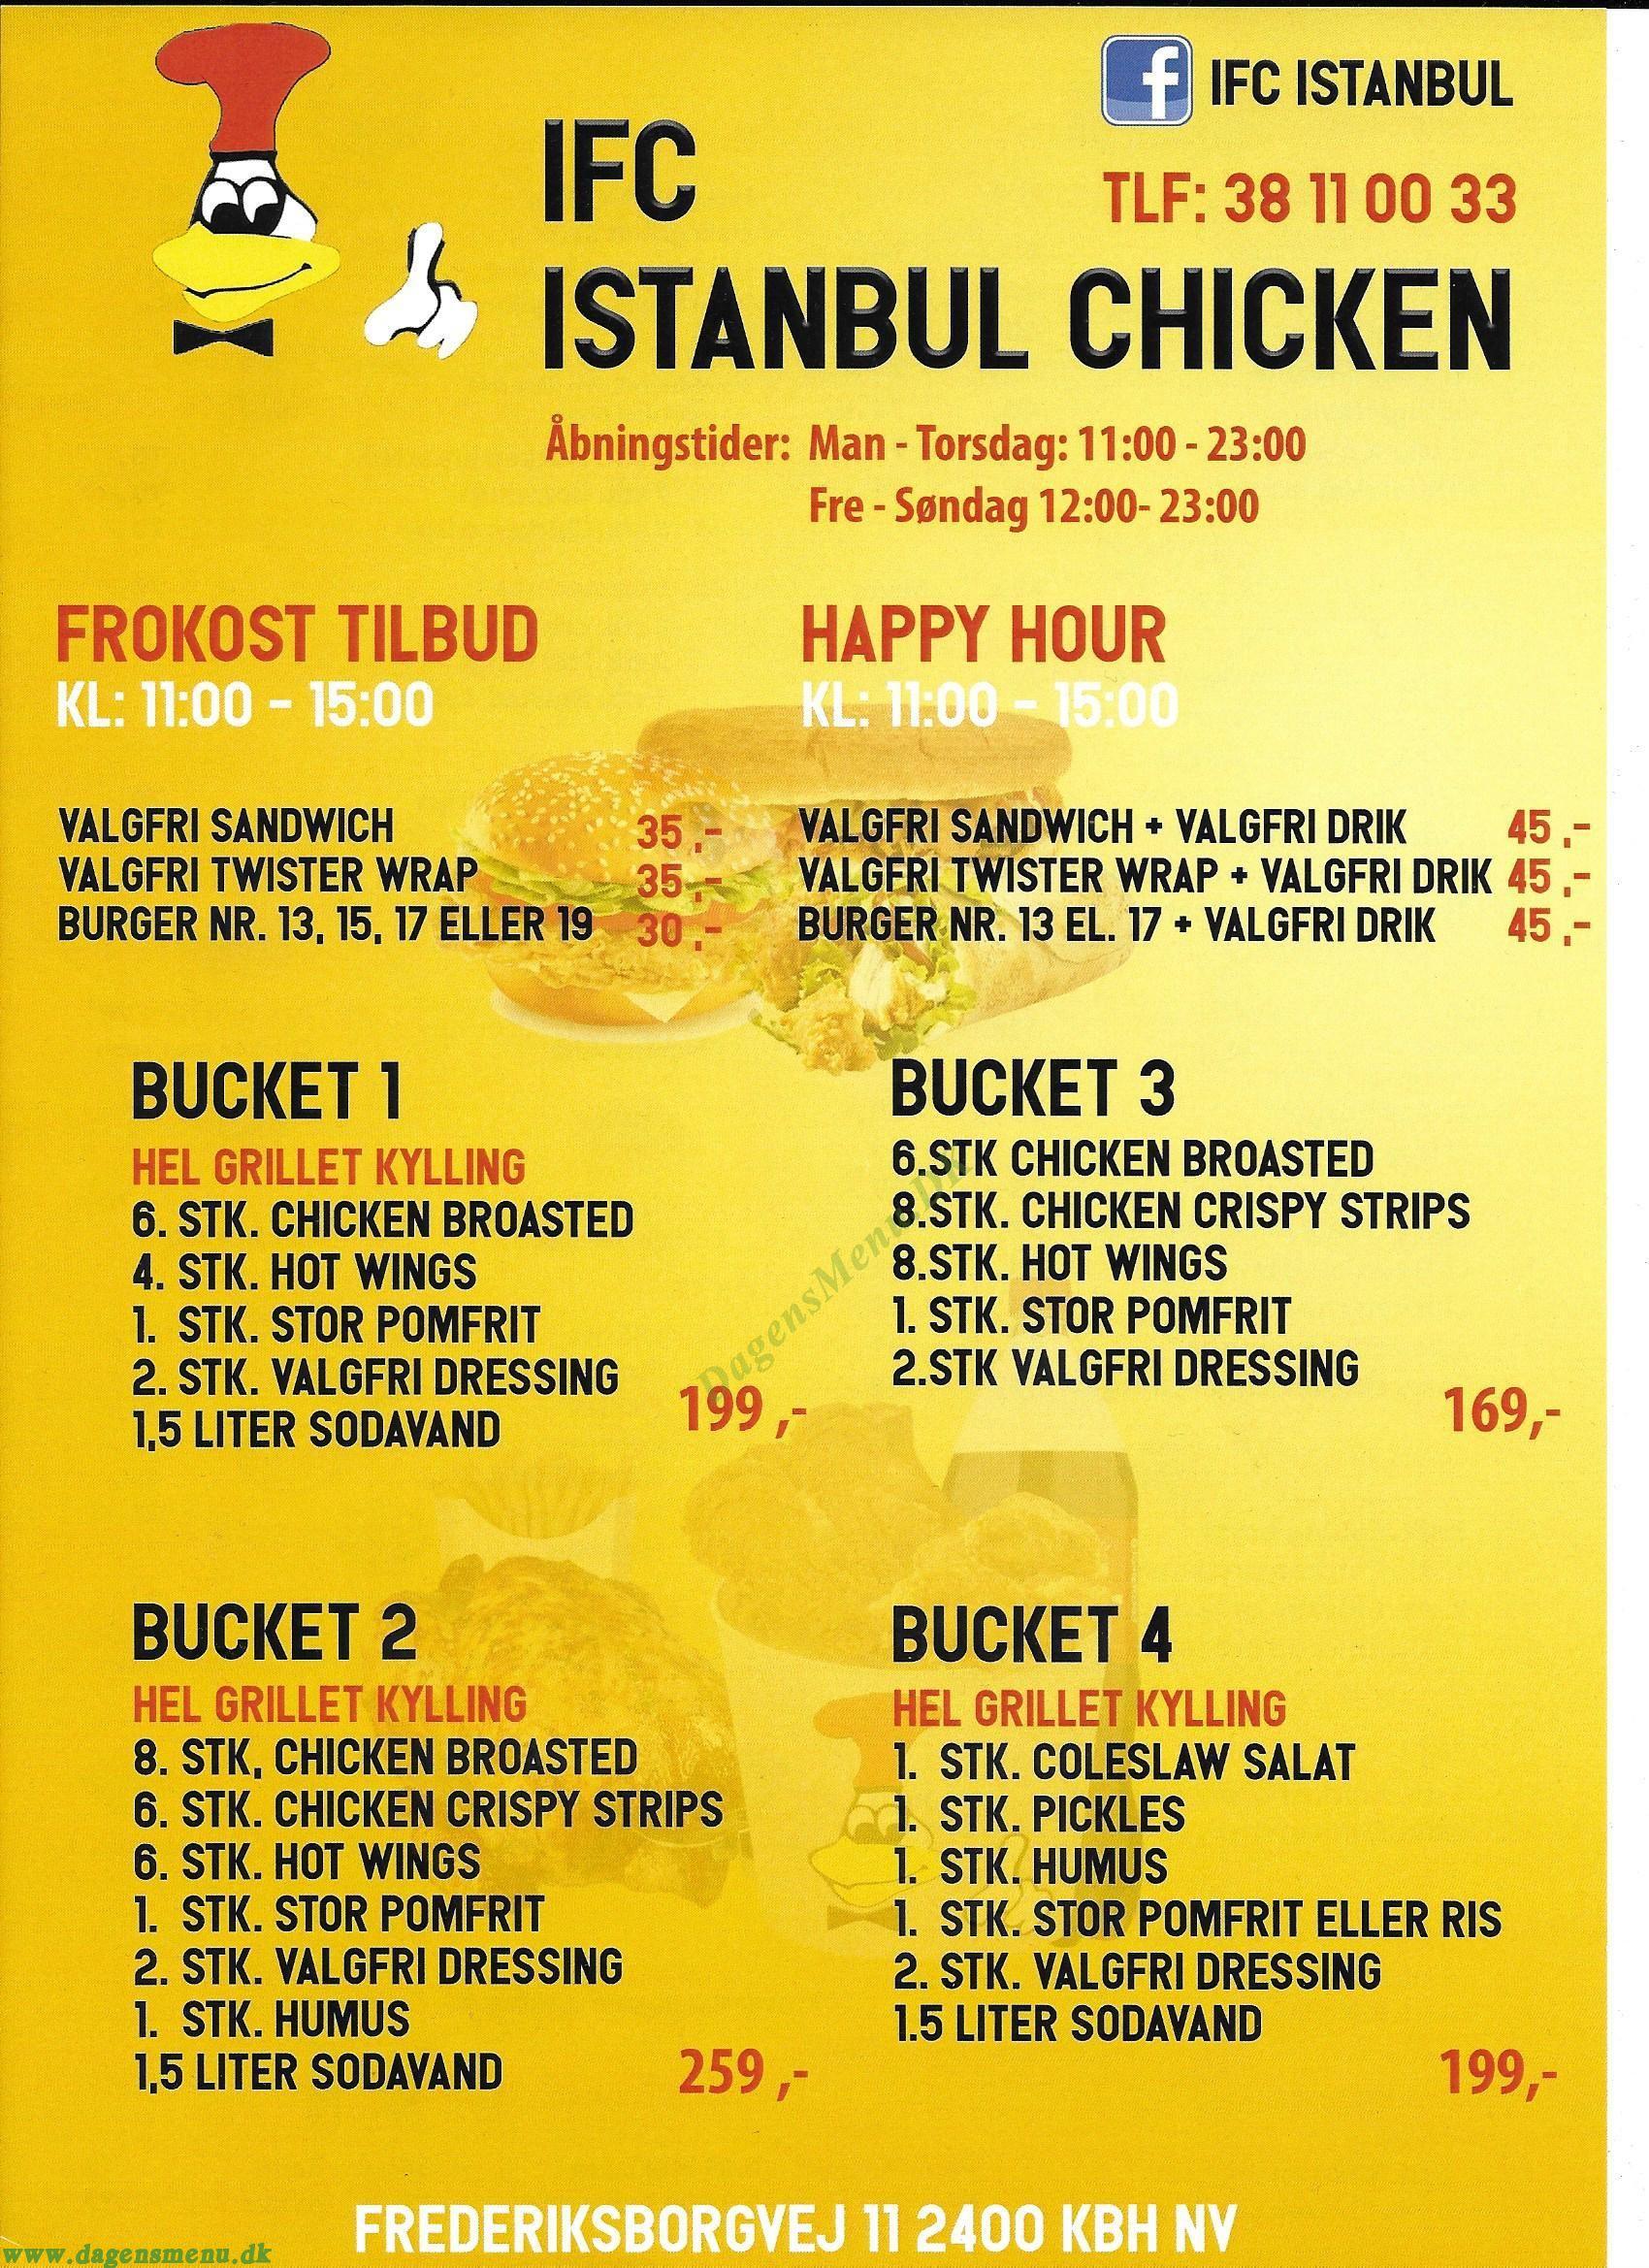 IFC Istanbul Chicken Menukort